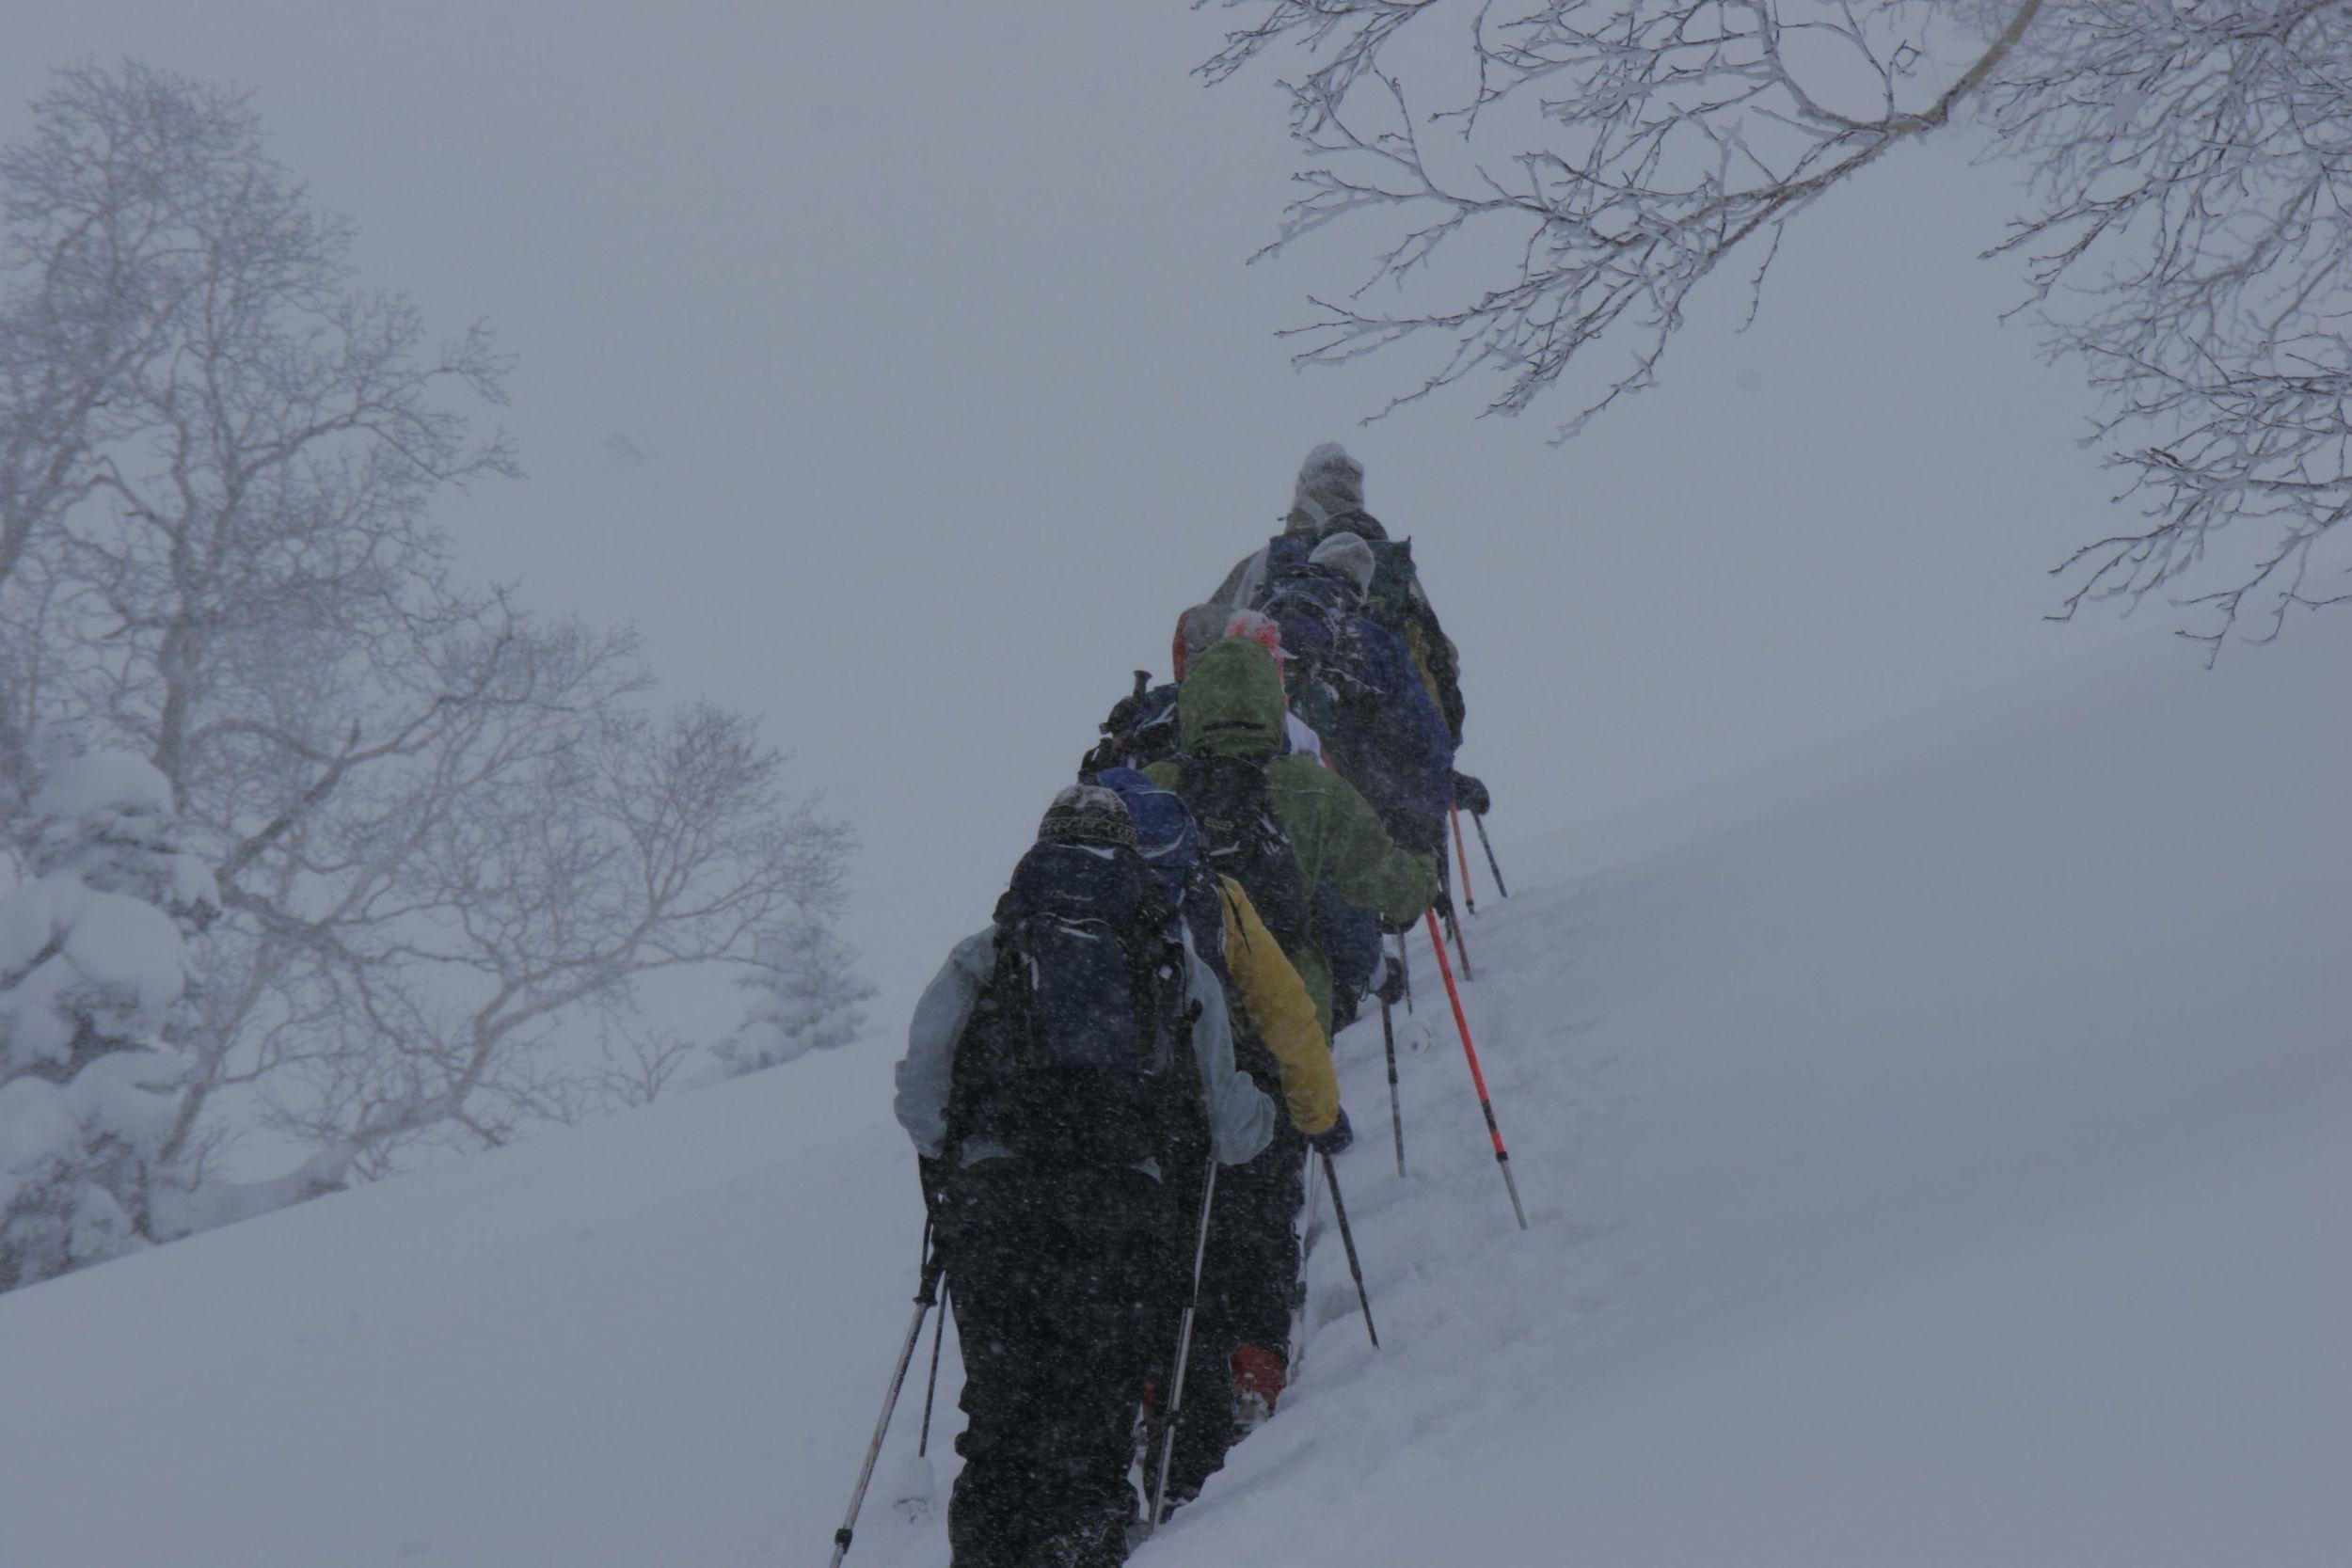 On the hunt for the next deep powder run, Asahi Dake.